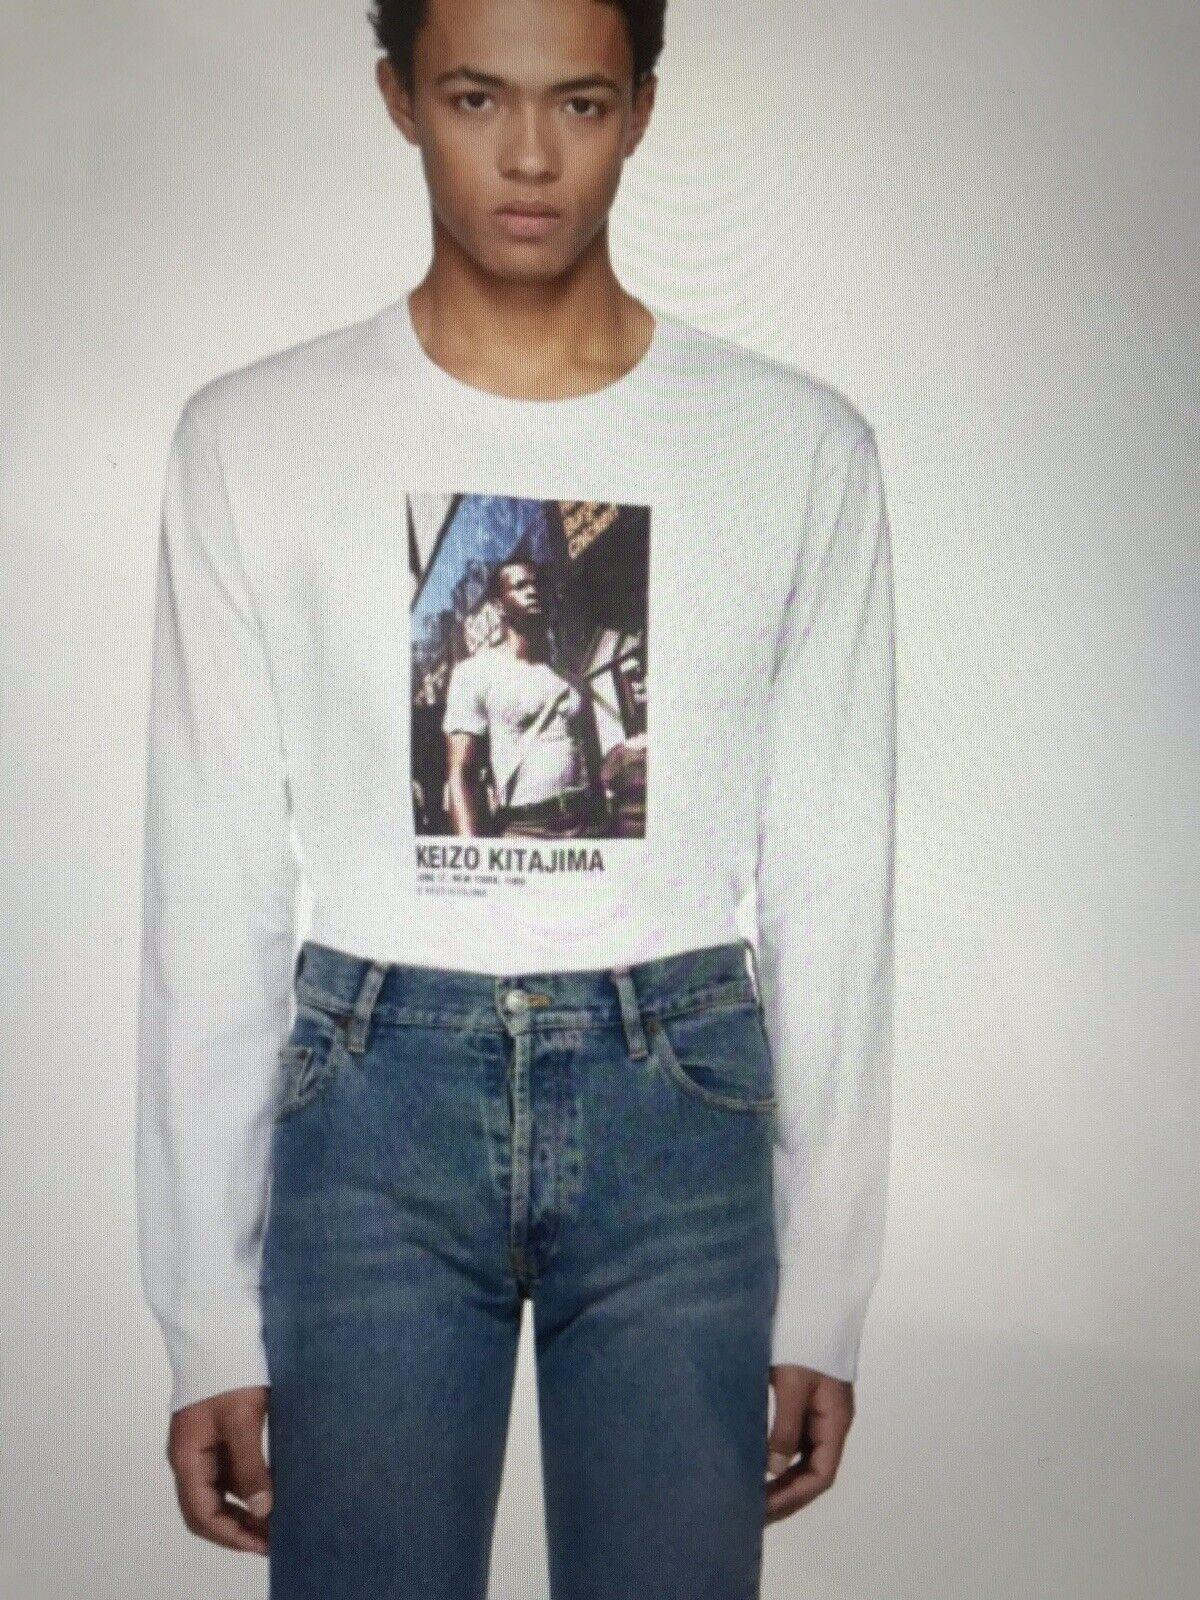 Nwt Helmut Lang Artist Series Long Sleeve T-Shirt S June 86 Keizo Kitajima